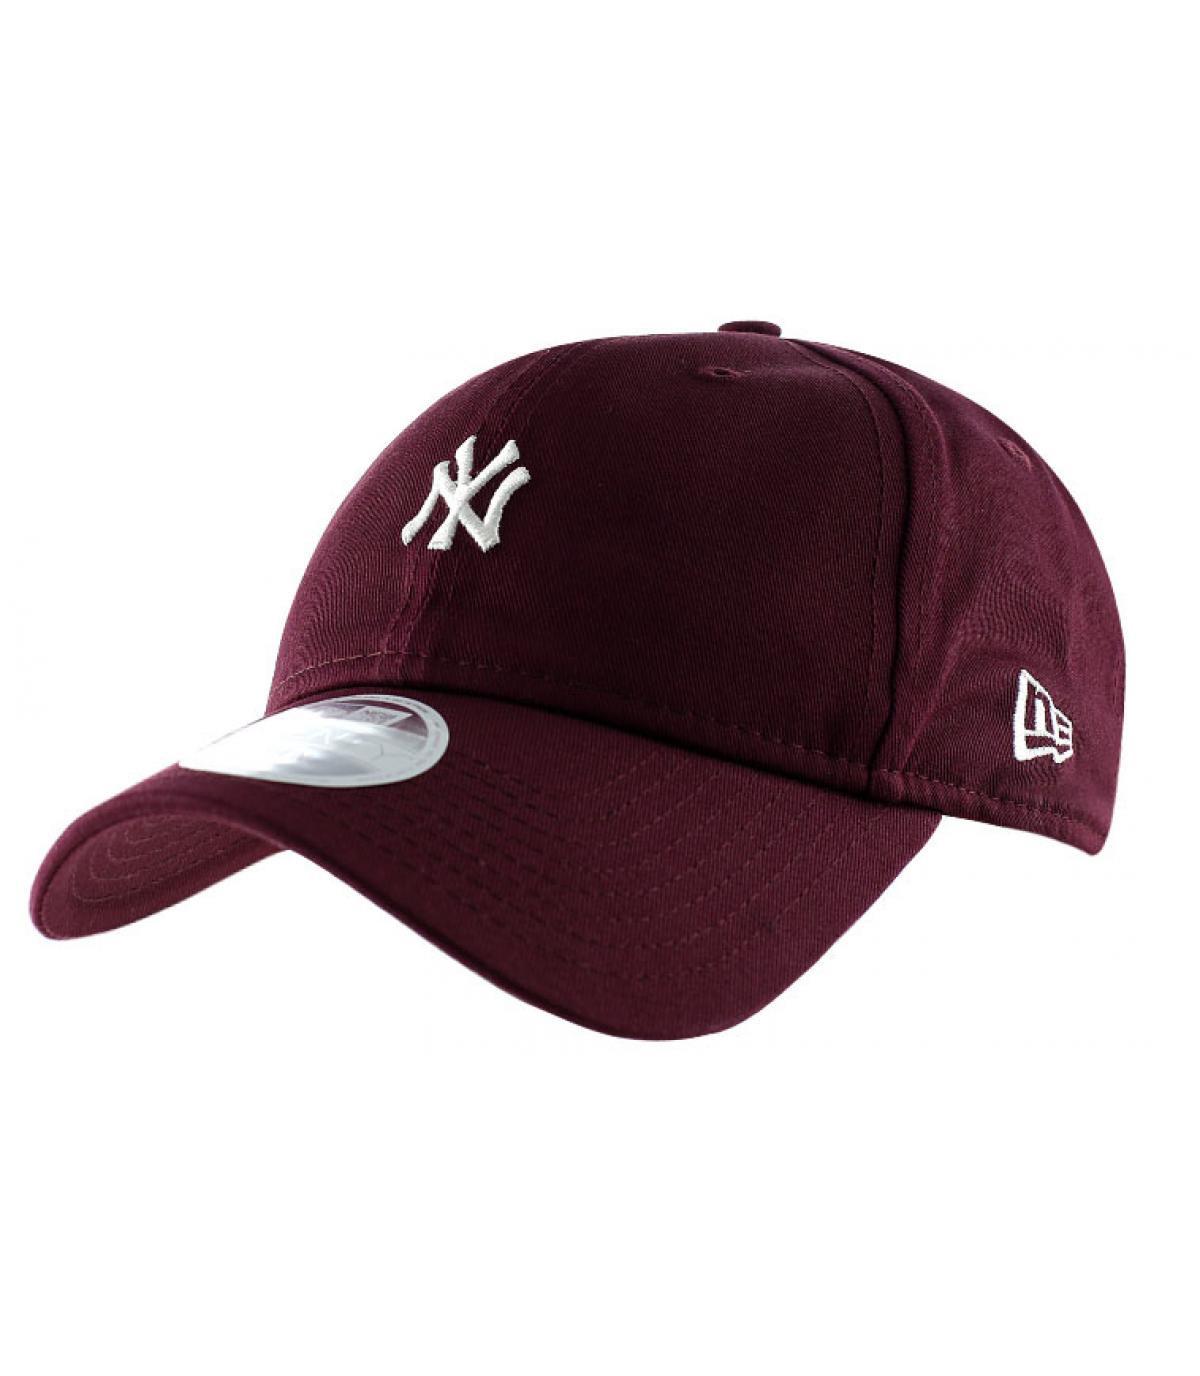 Women NY cap - Women mini logo maroon cap by New Era. Headict bcf12ccdc93